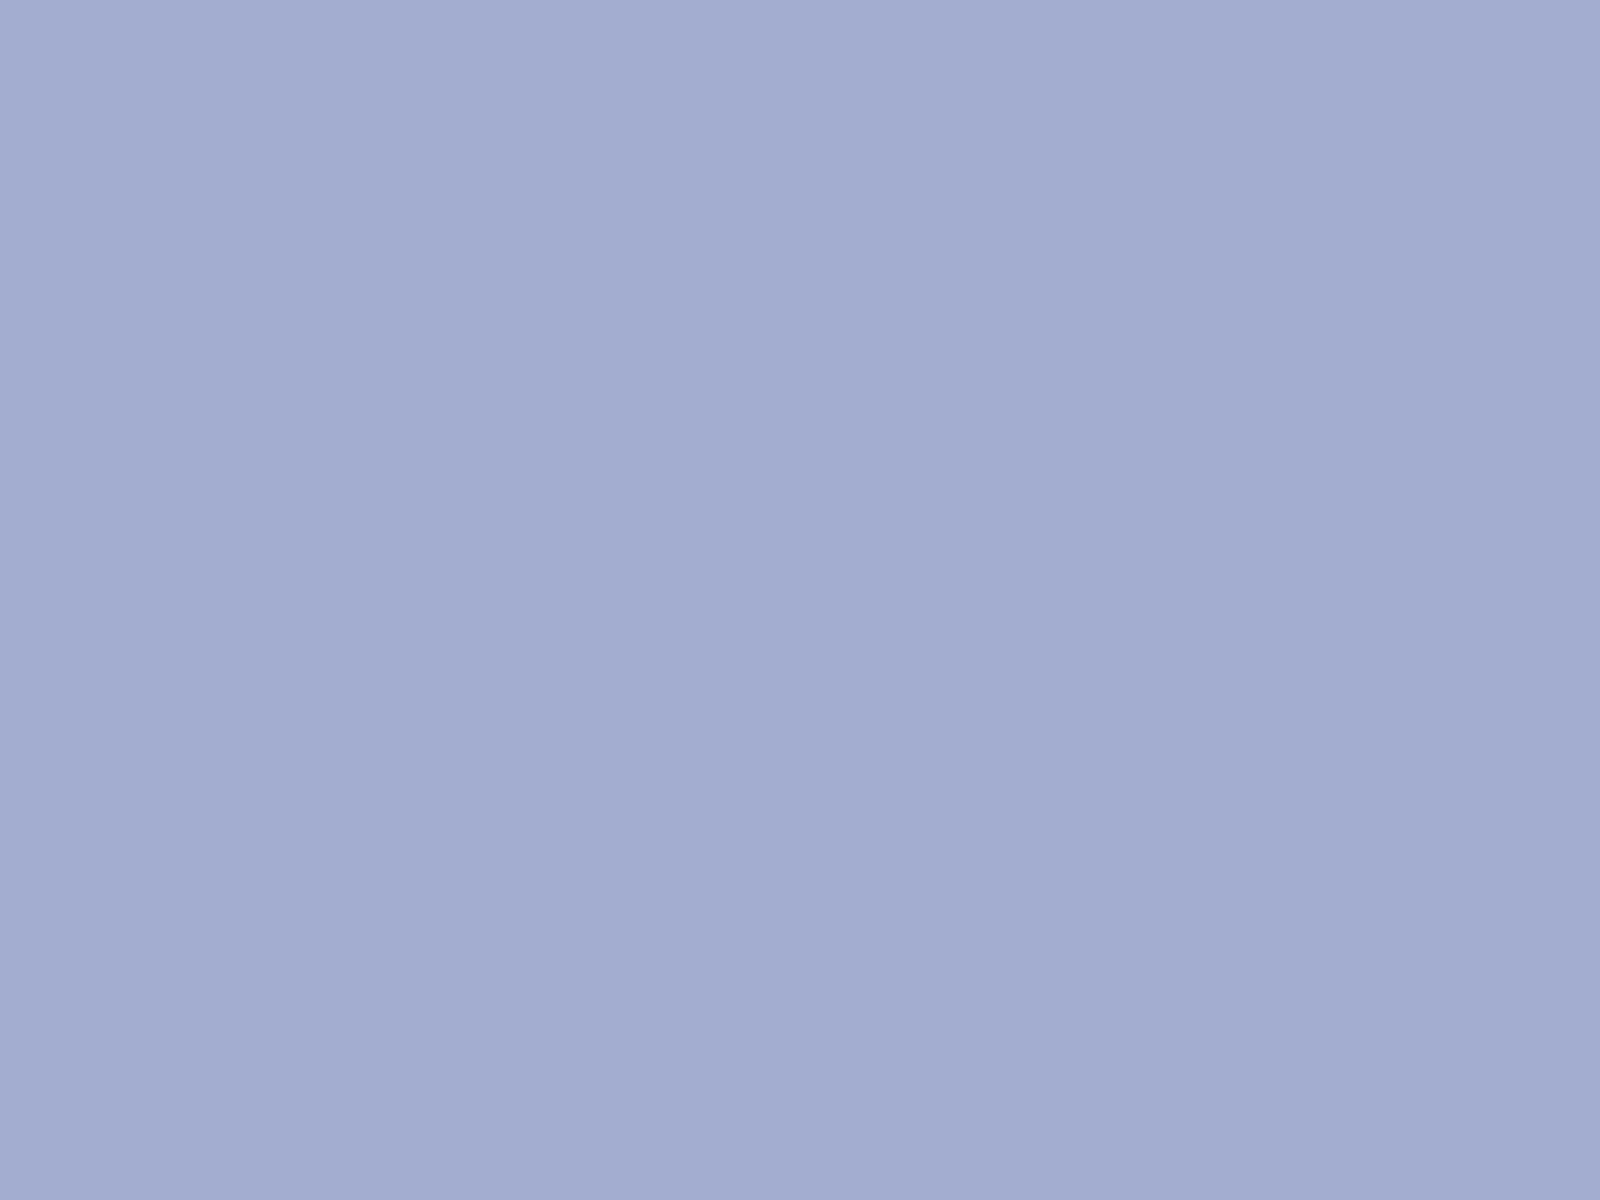 1600x1200 Wild Blue Yonder Solid Color Background